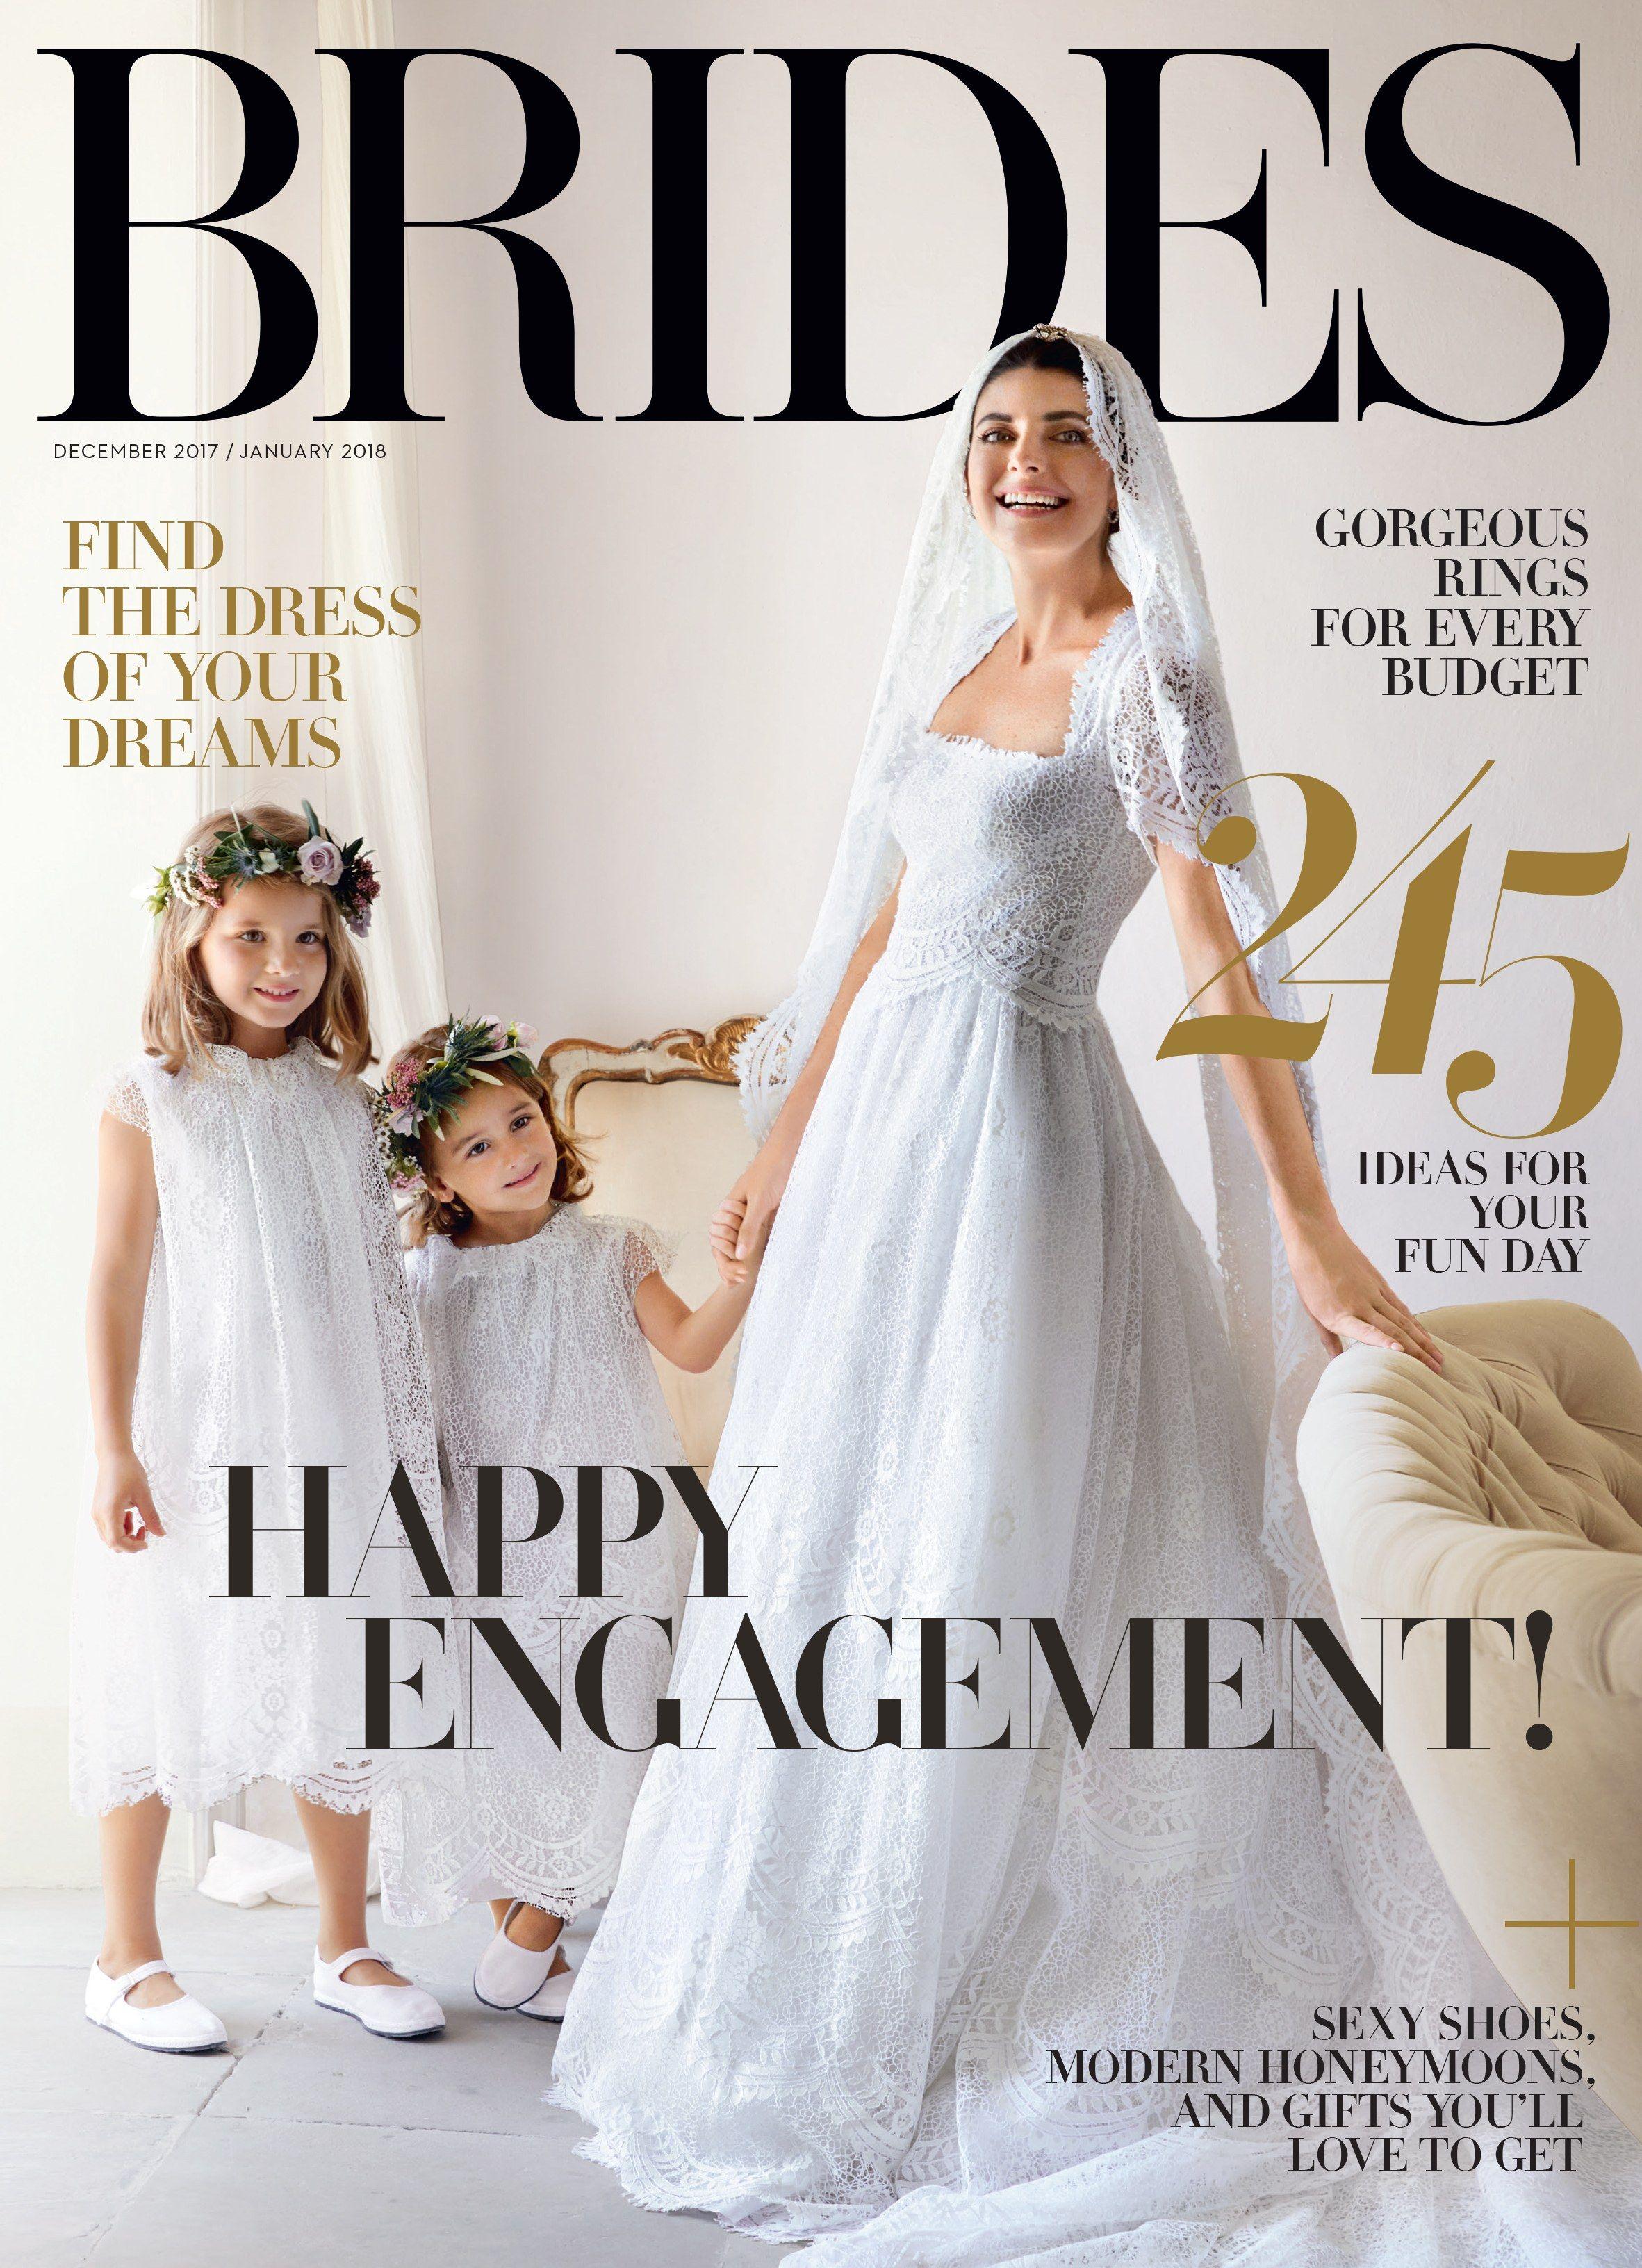 Celebrity Weddings And Engagements Free Wedding Dress Wedding Dress Catalog Bride